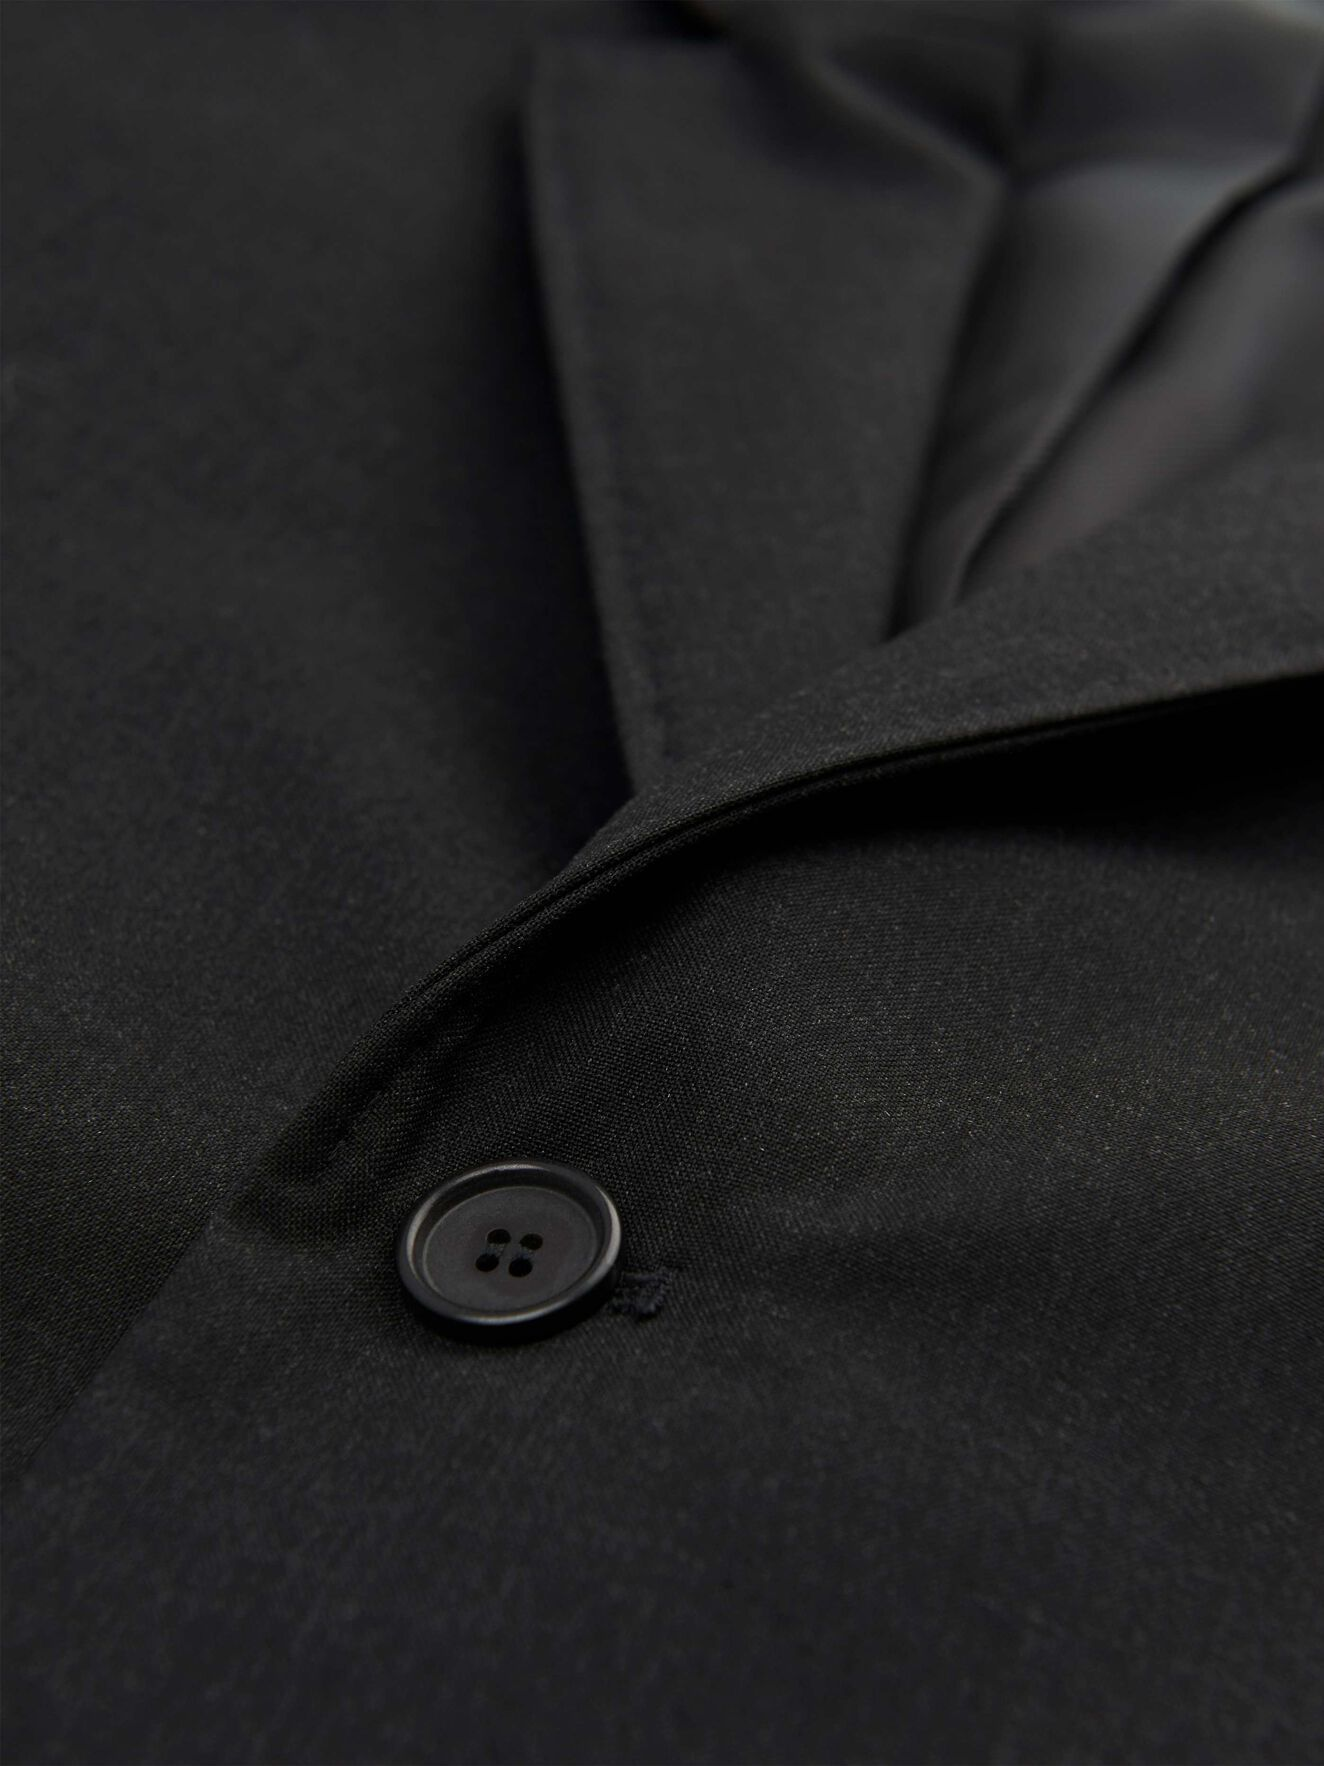 Cempey Coat in Dark grey Mel from Tiger of Sweden